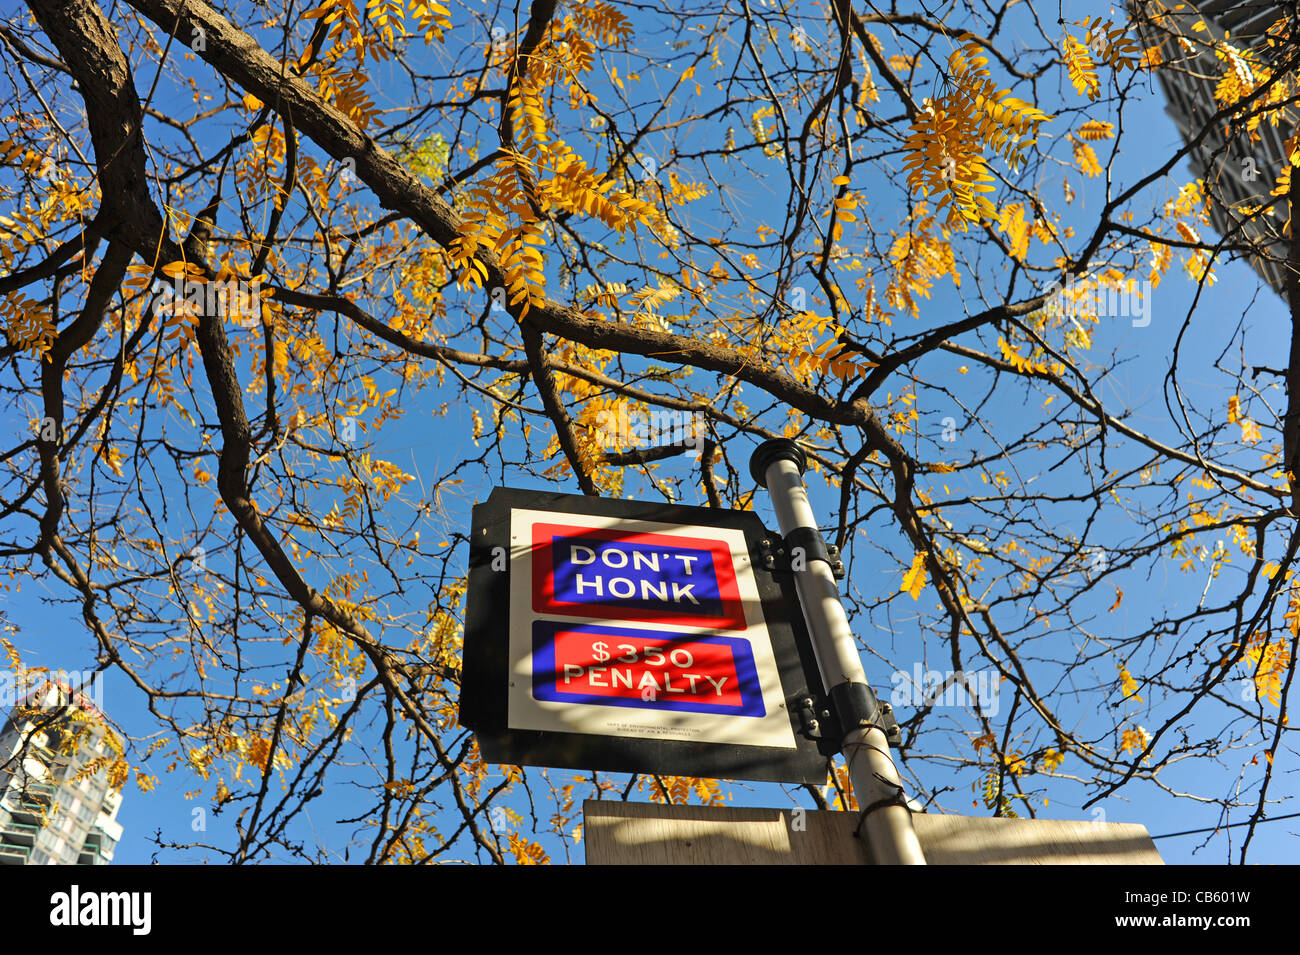 Don't Honk fine sign in Manhattan New York NYC USA Photograph taken November 2011 - Stock Image